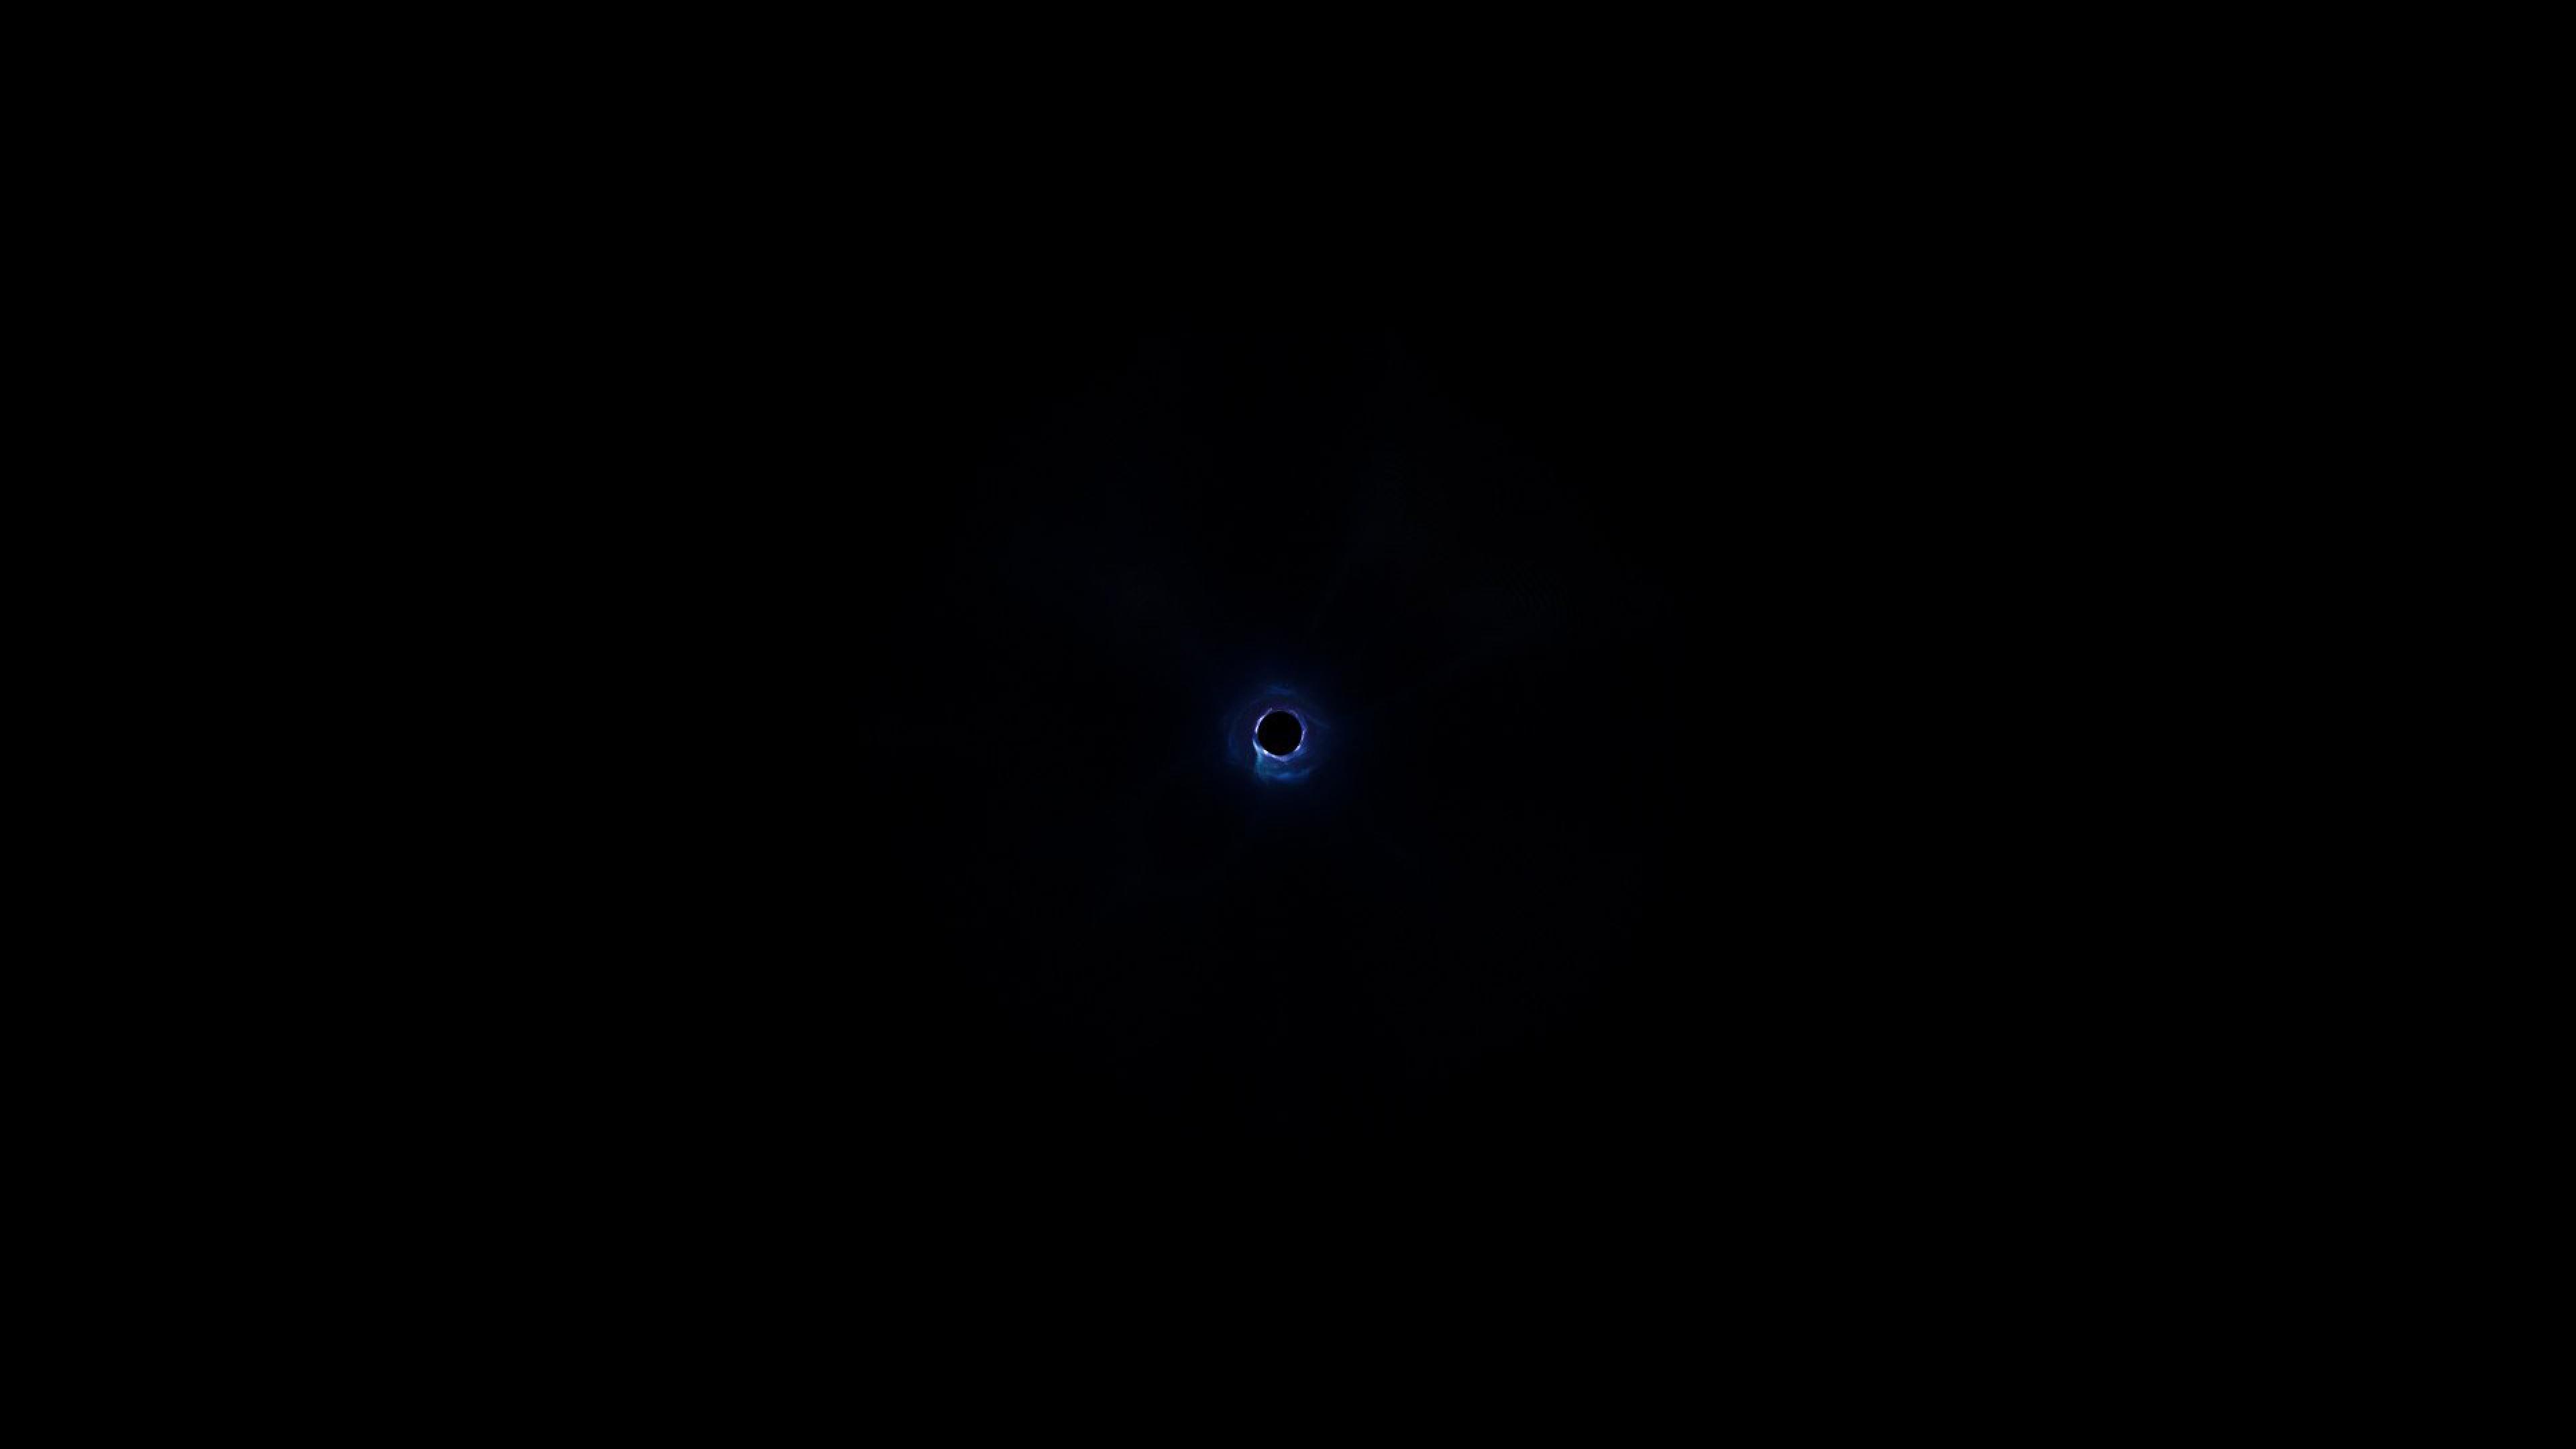 3840x2160 Fortnite Black Hole 4K Wallpaper, HD Games 4K ...